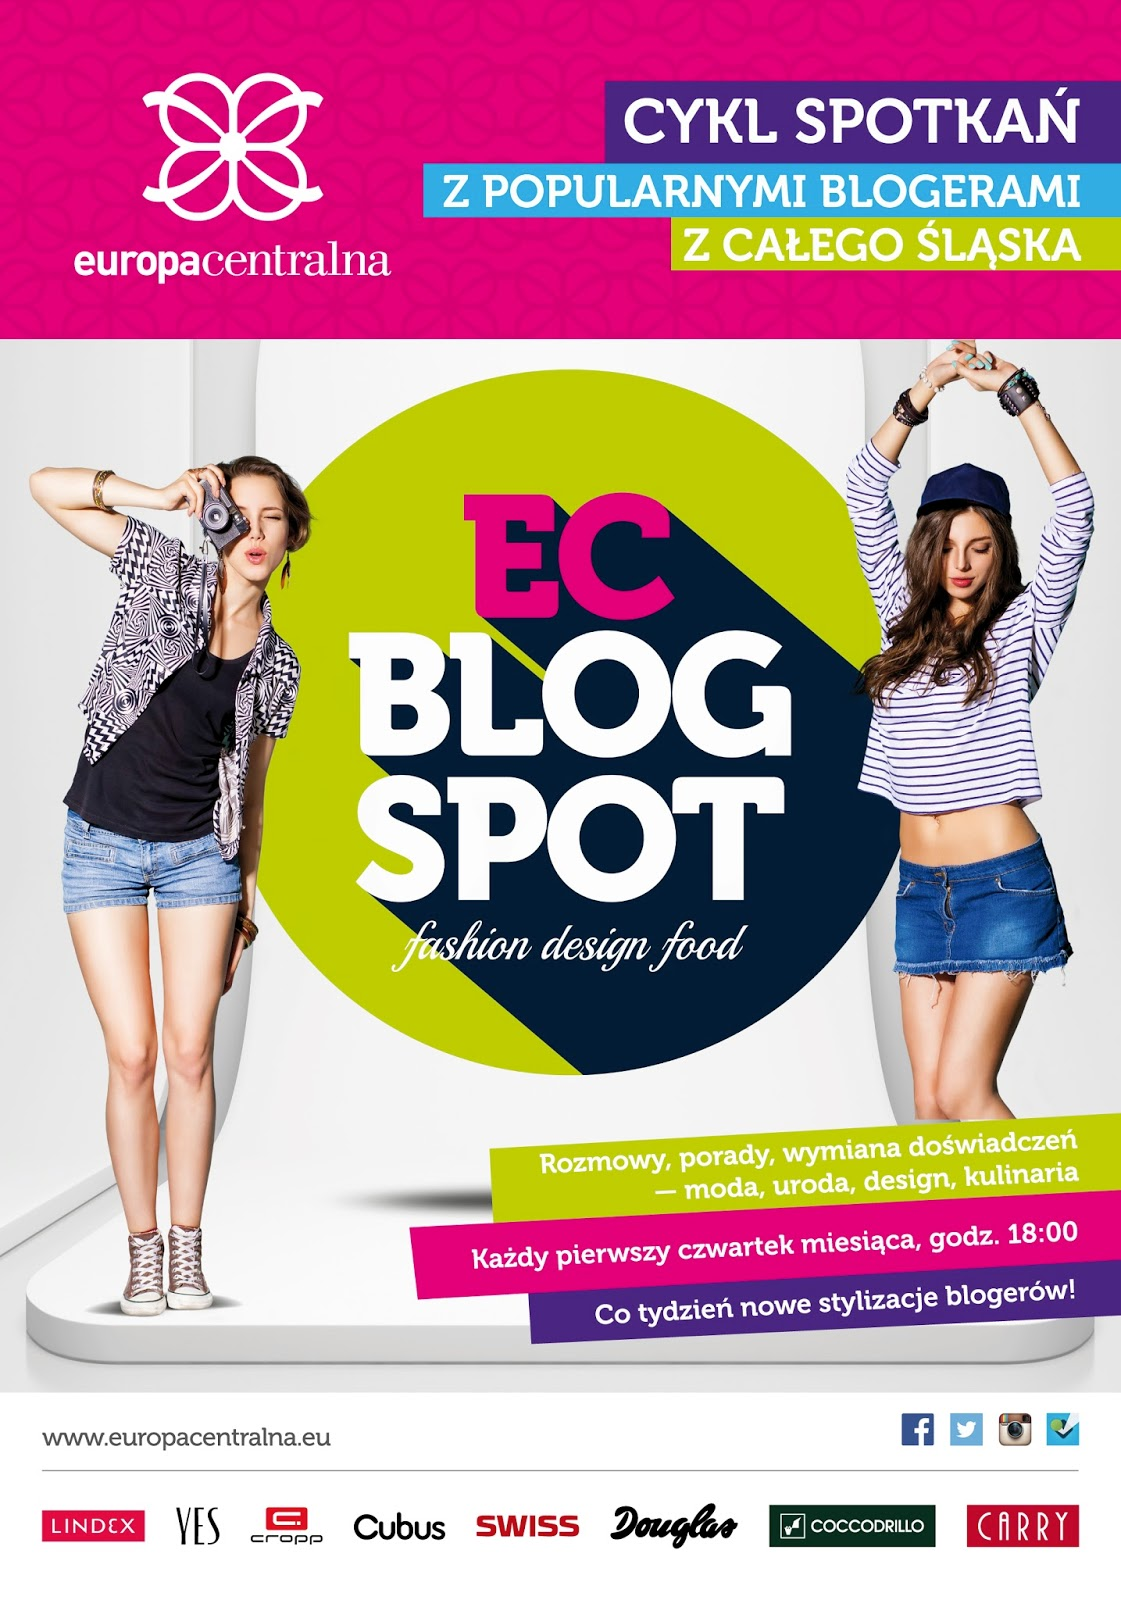 ec_blog-spot_2014_B1-70x100cm_250dpi_PRE